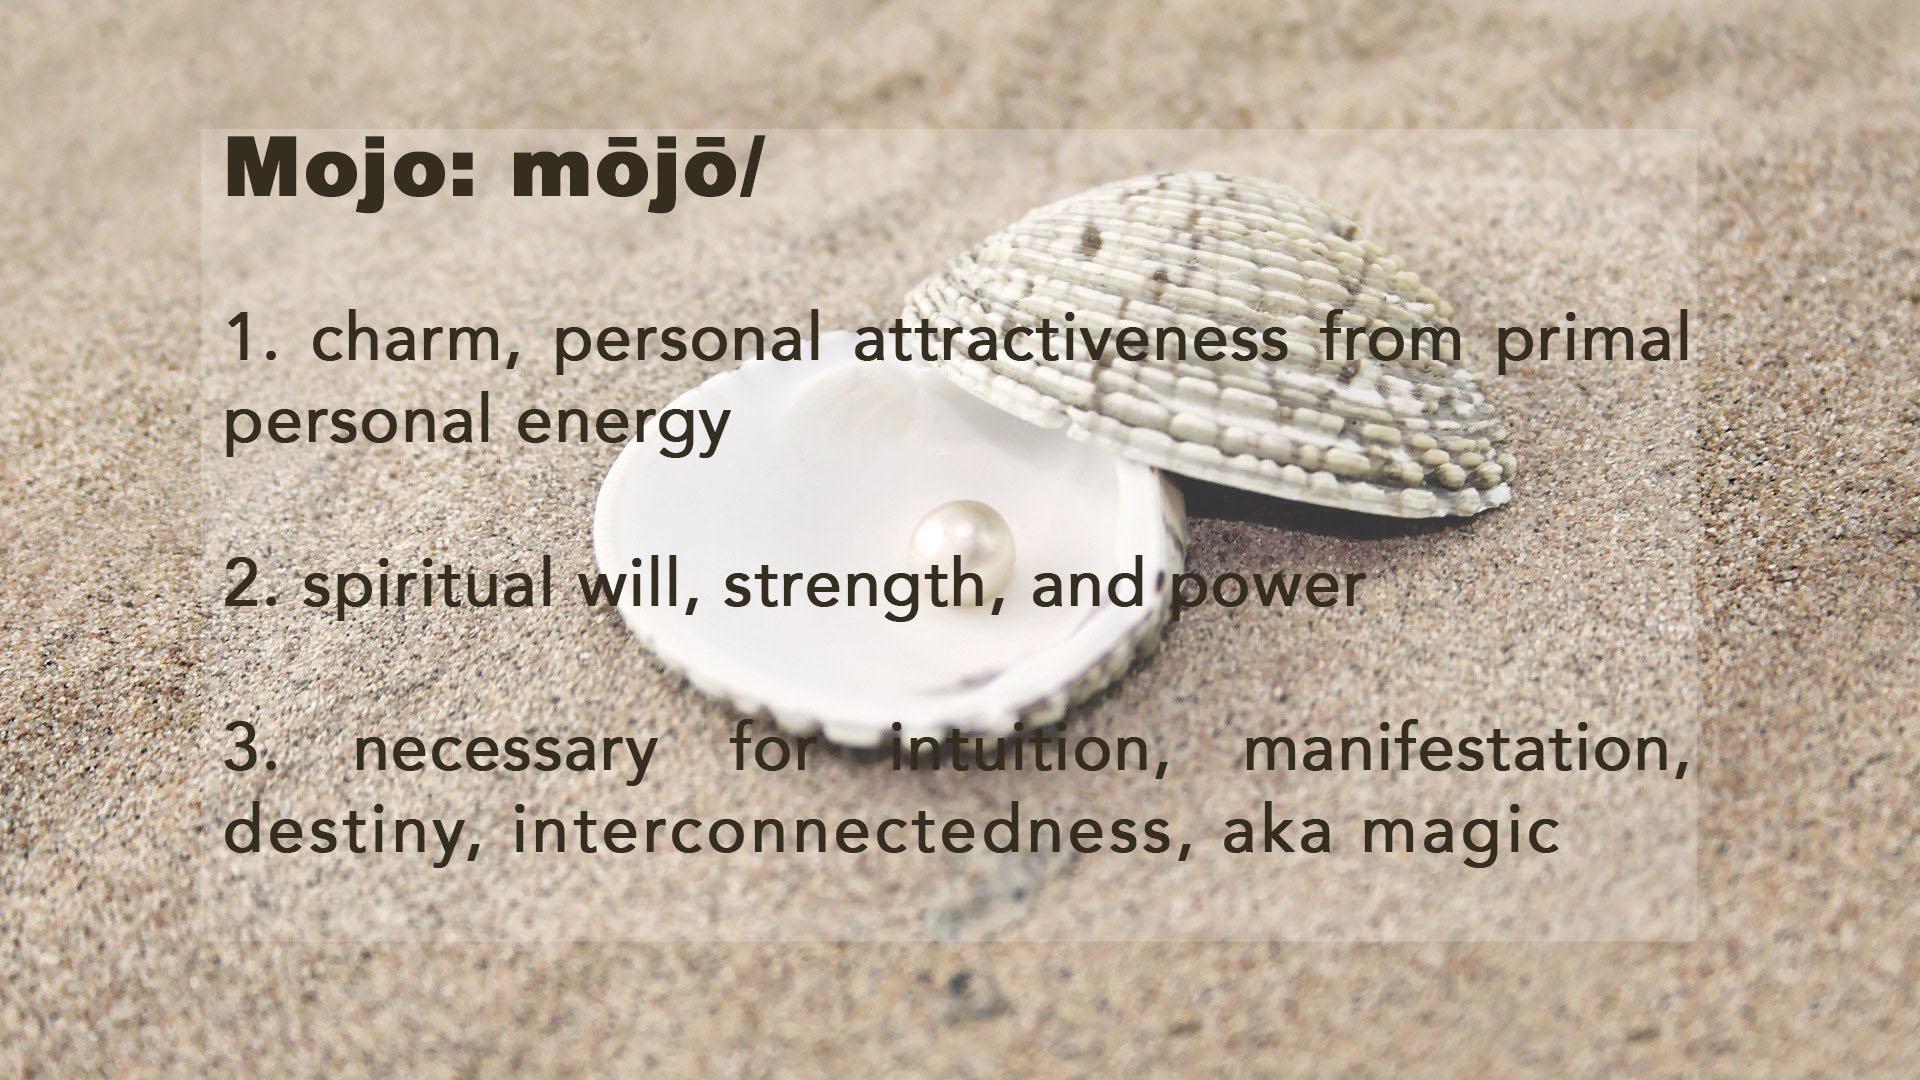 MojoDefinition-Seashell2.jpg